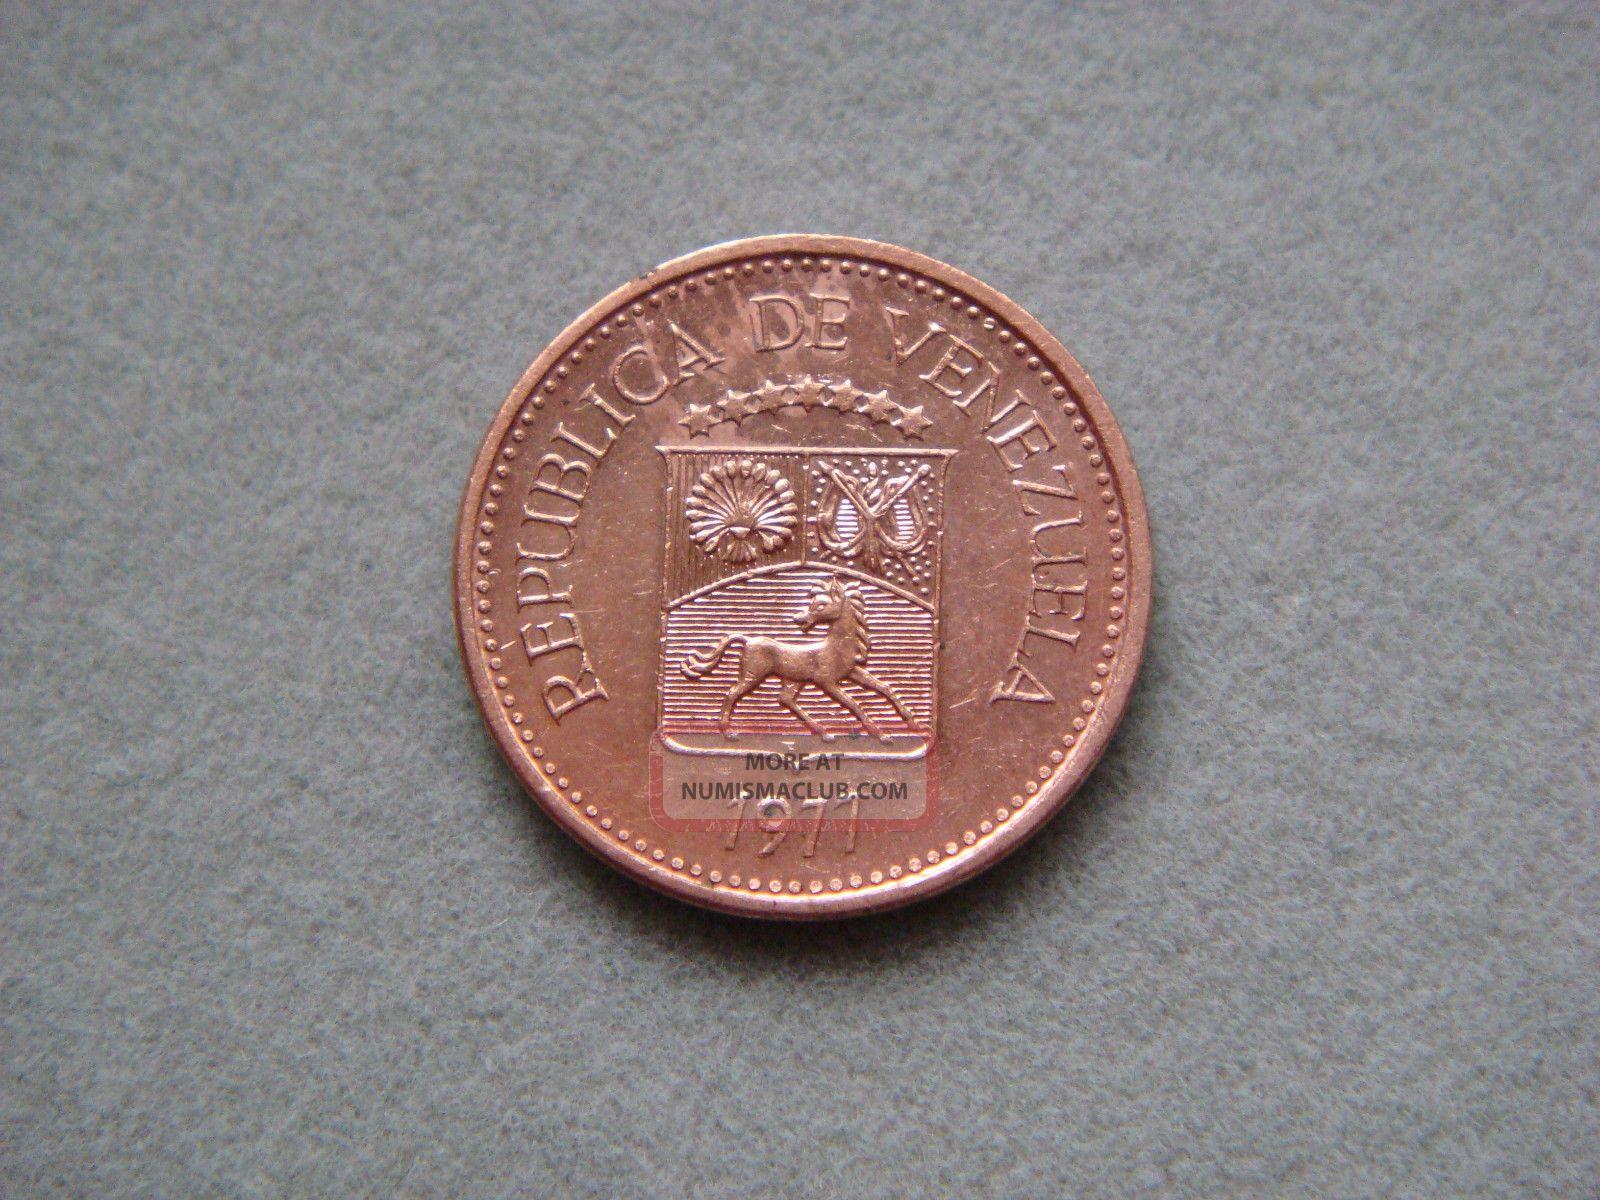 1977 5 cent coin value - Catfish haven louisville